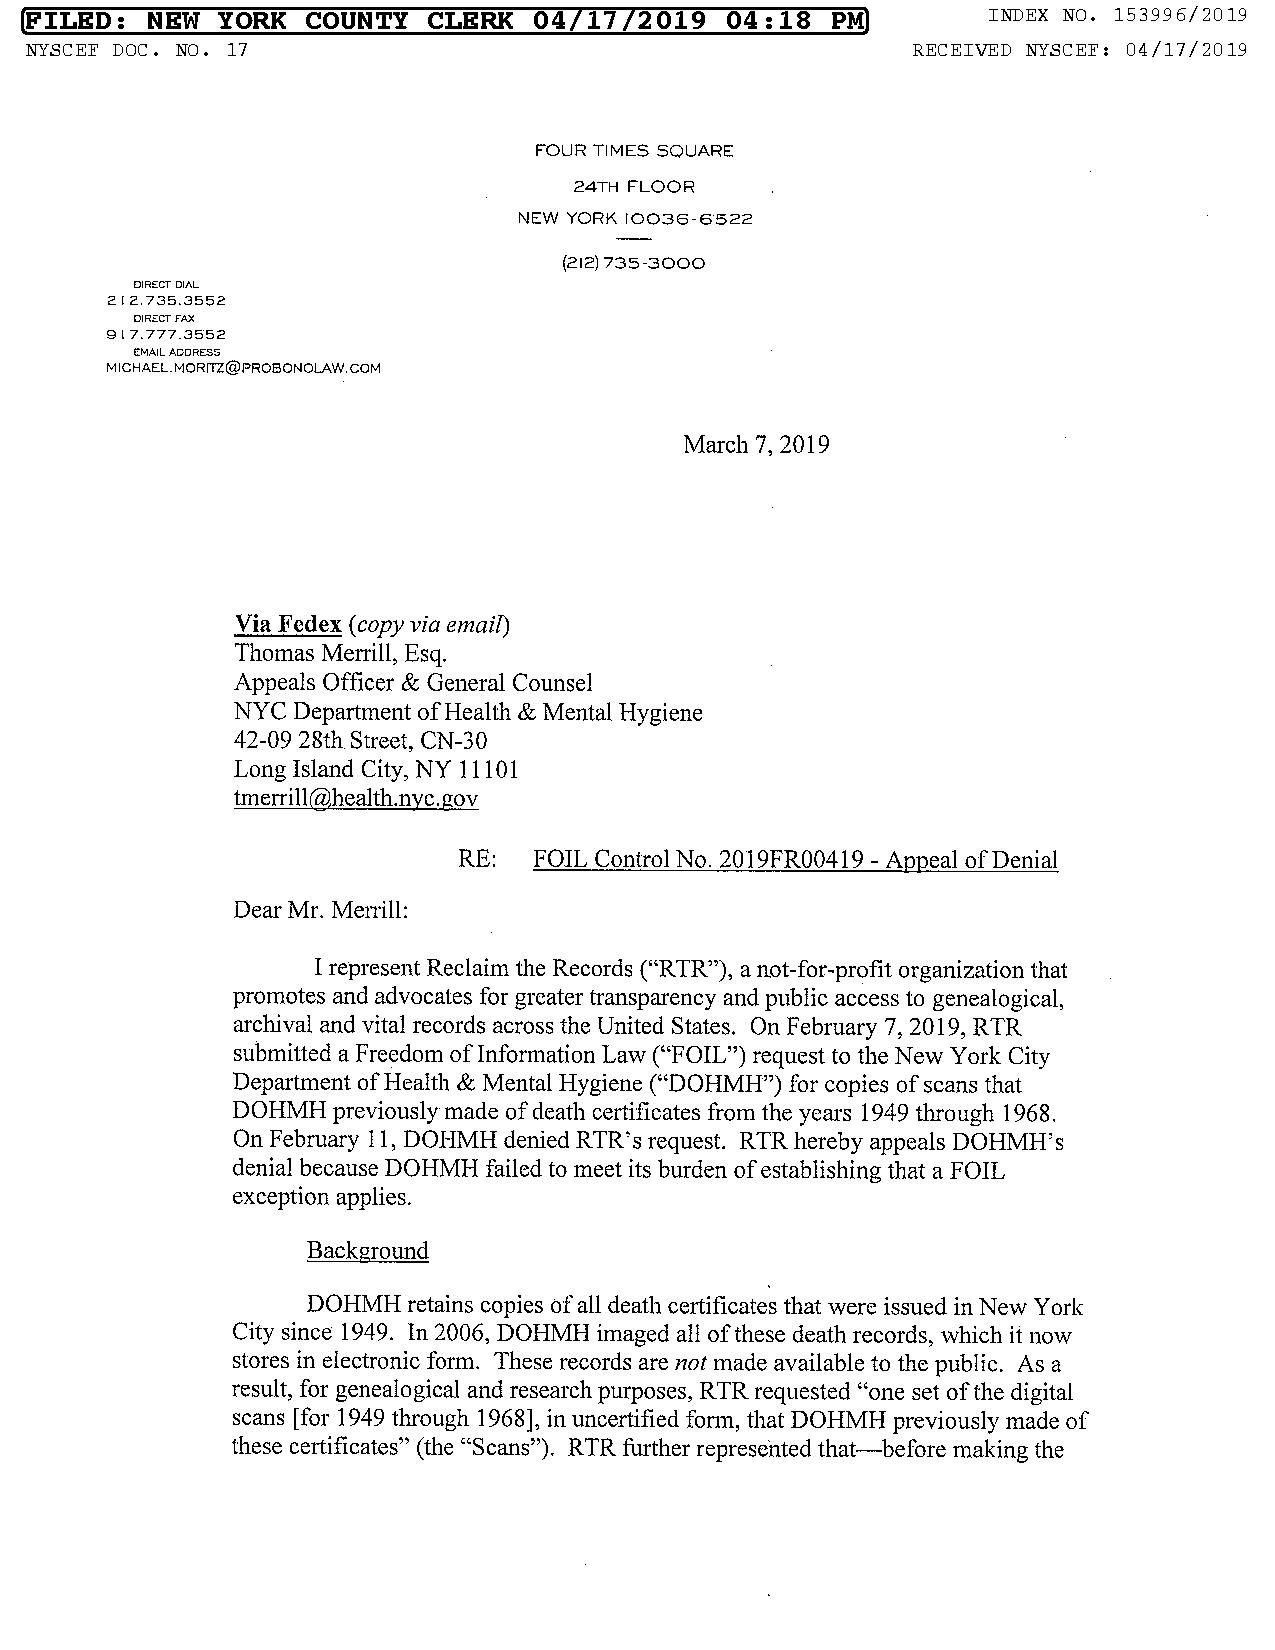 Appeal of their FOIL denial